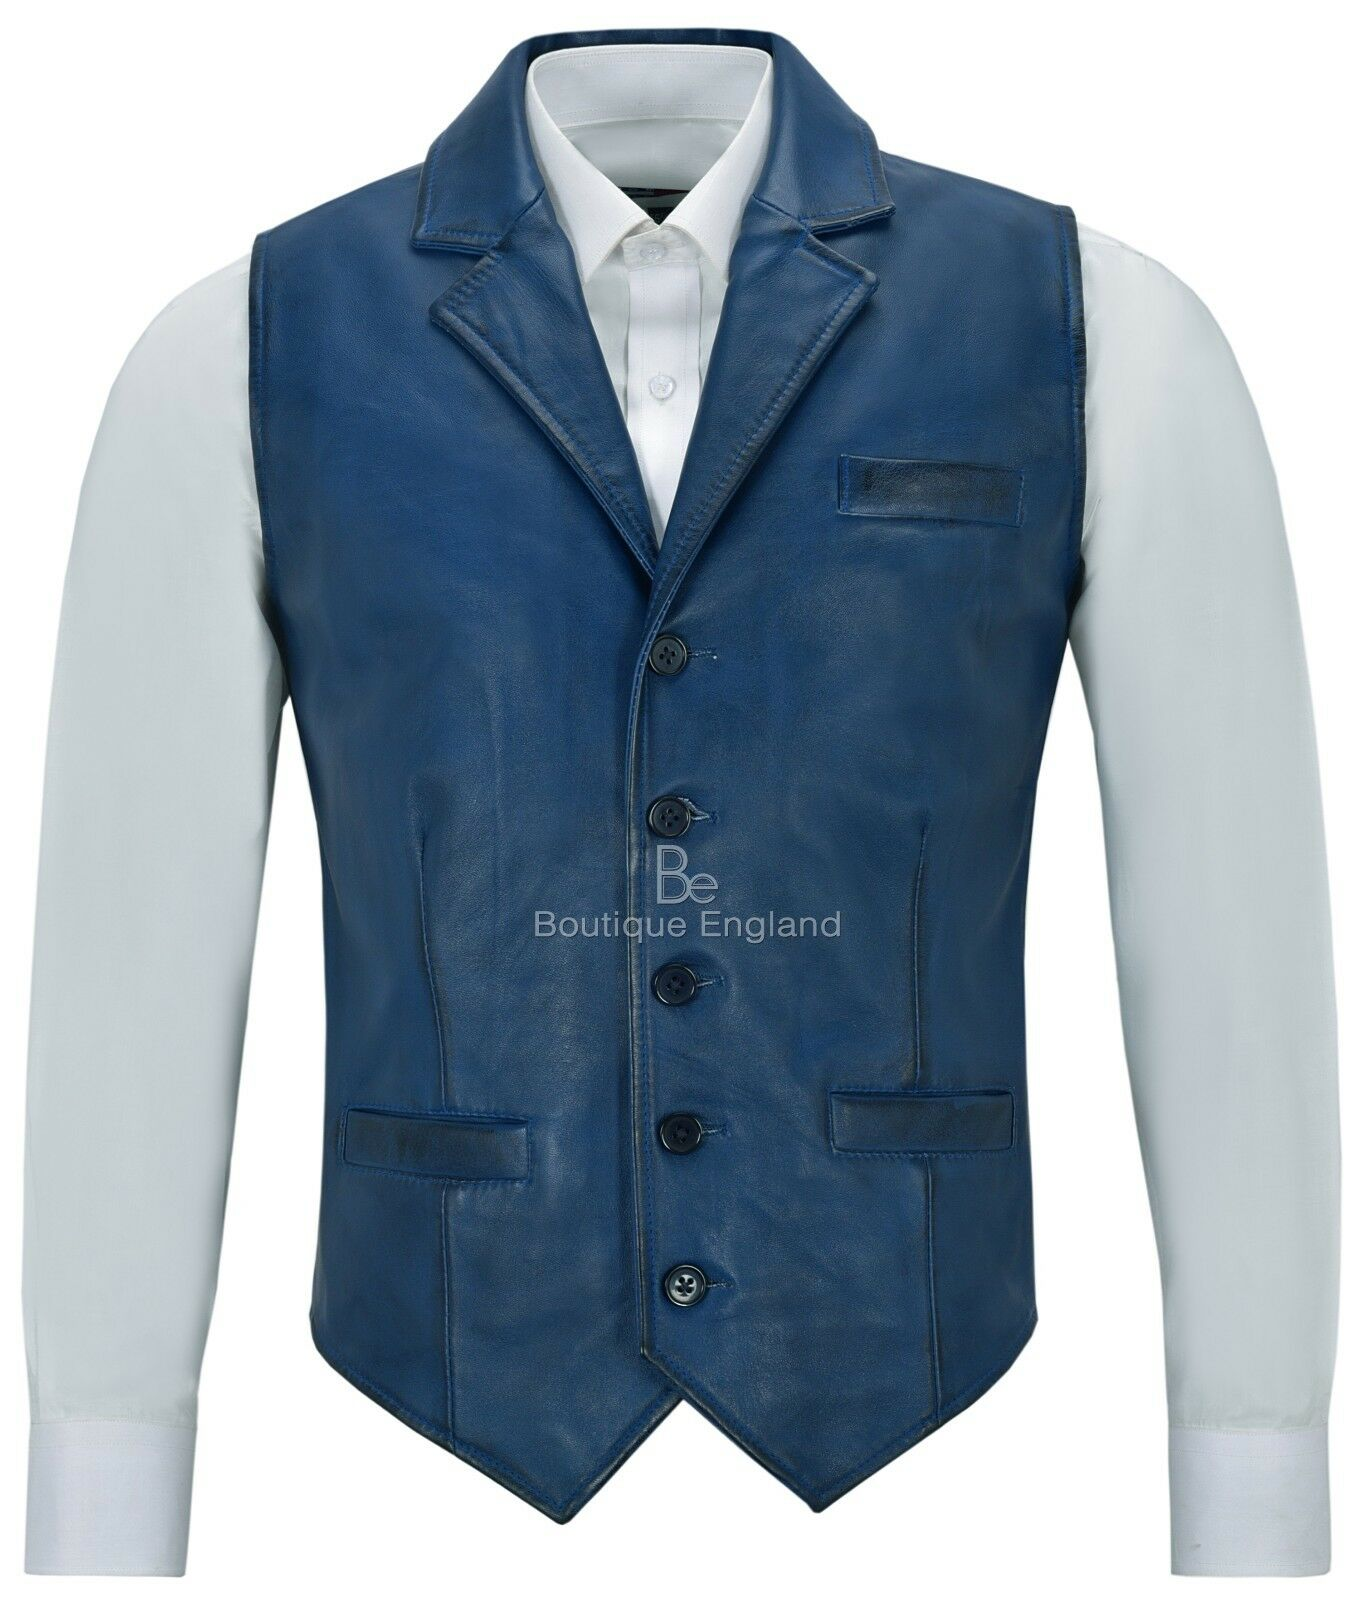 Men Real Leder Waistcoat Blau Napa Party Fashion Casual Geschäft Vest 1349